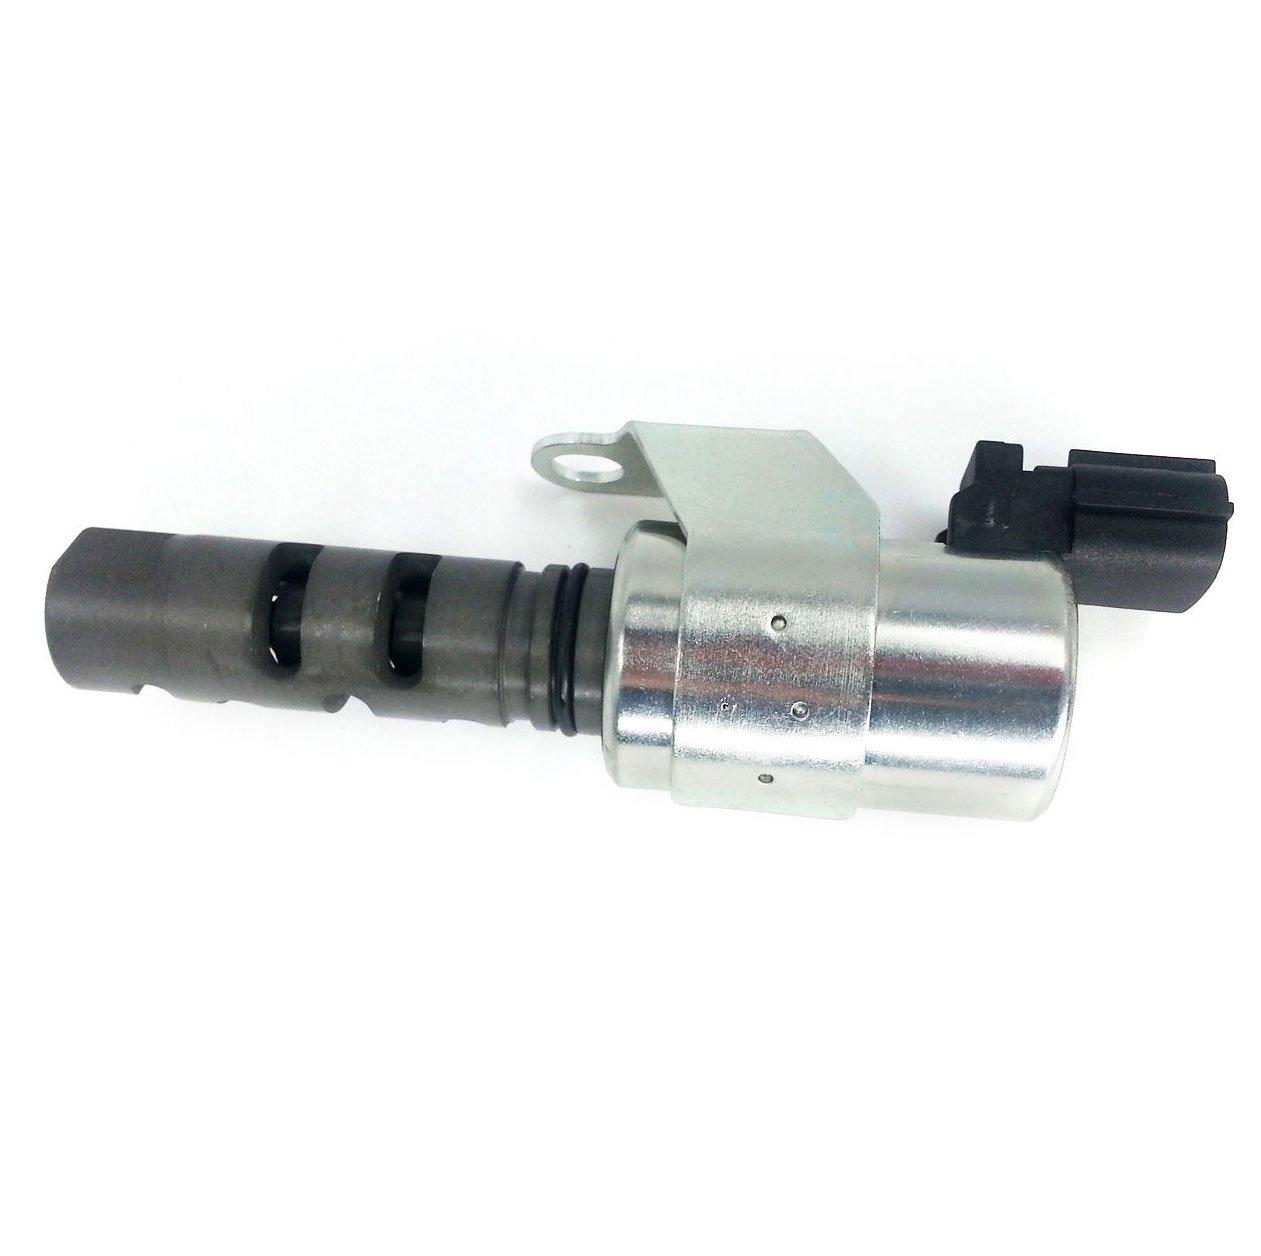 Engine Oil Cam Camshaft Variable Valve Timing Control Solenoid VVTi for Lexus GS300 IS300 SC300 Supra Fix VSC lights